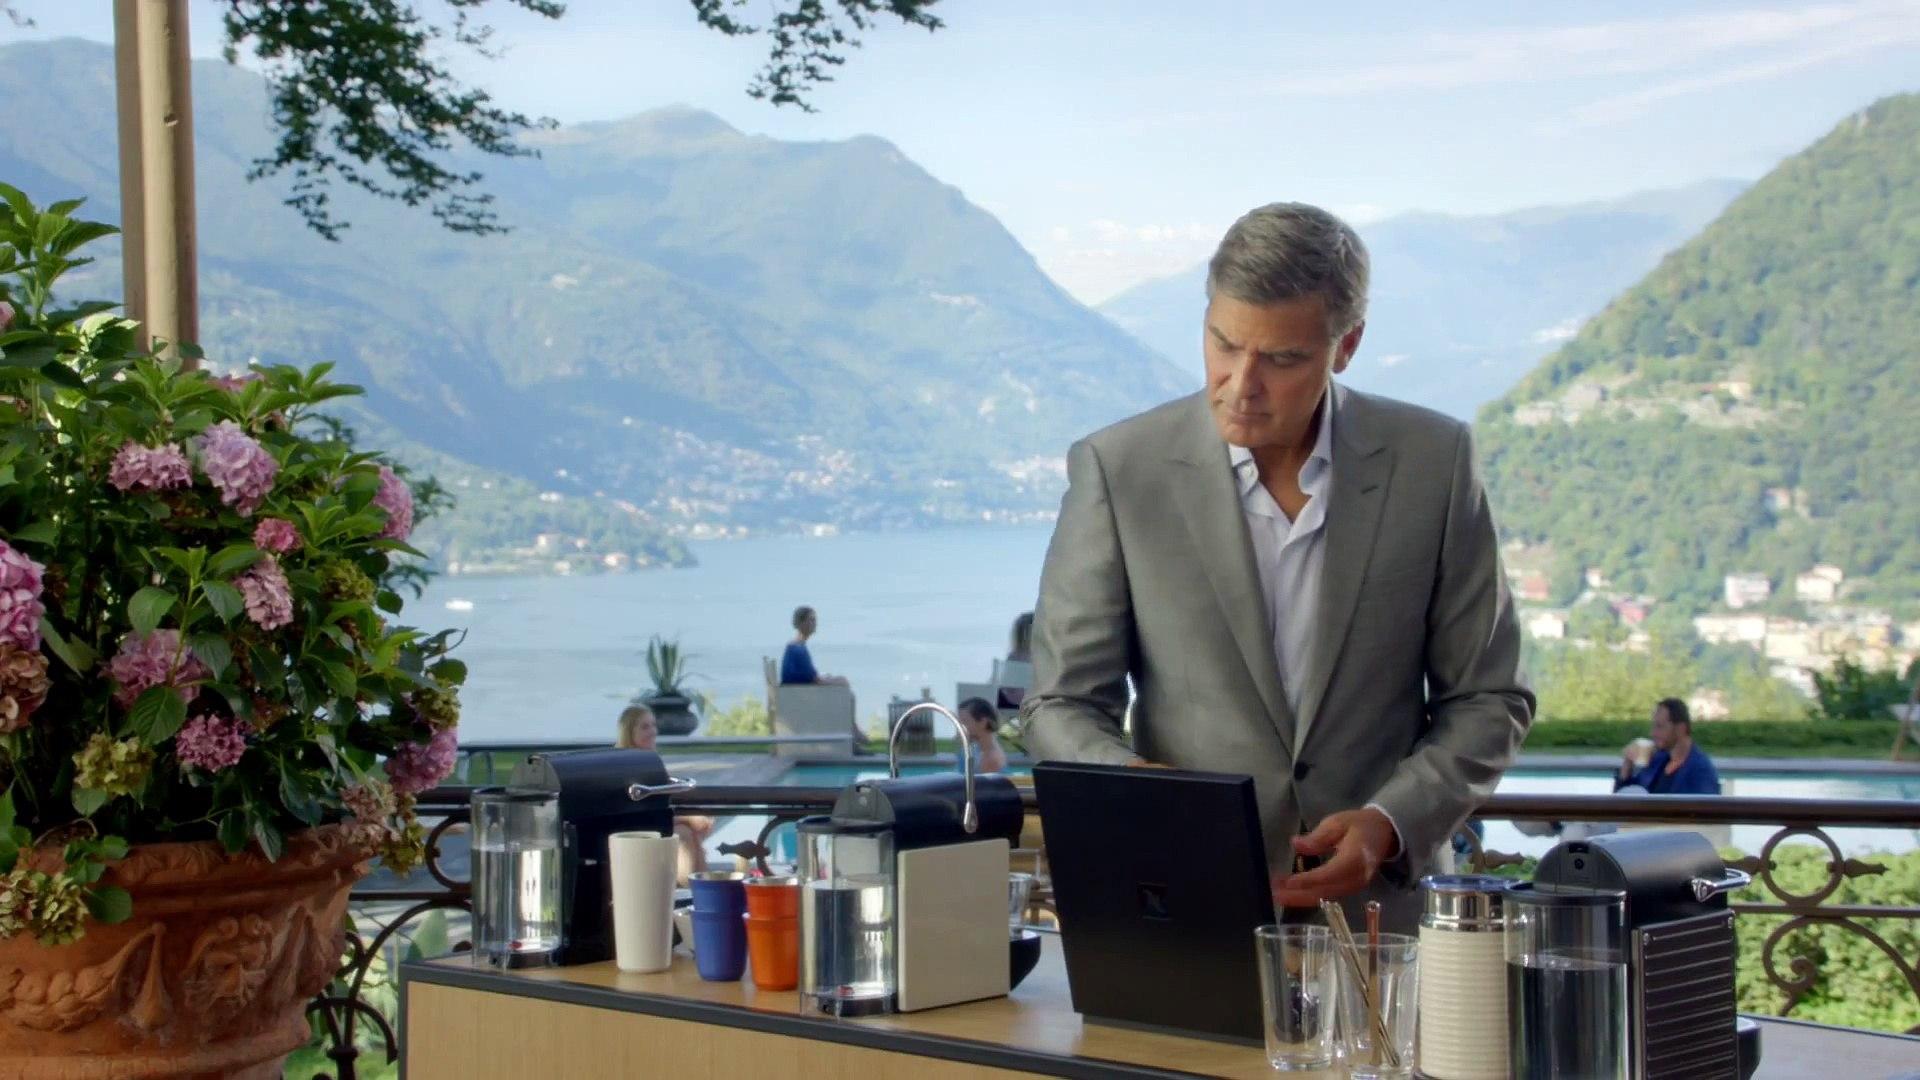 Pub Nespresso - What more ? avec Jack Black et Georges Clooney - Teaser [HD]